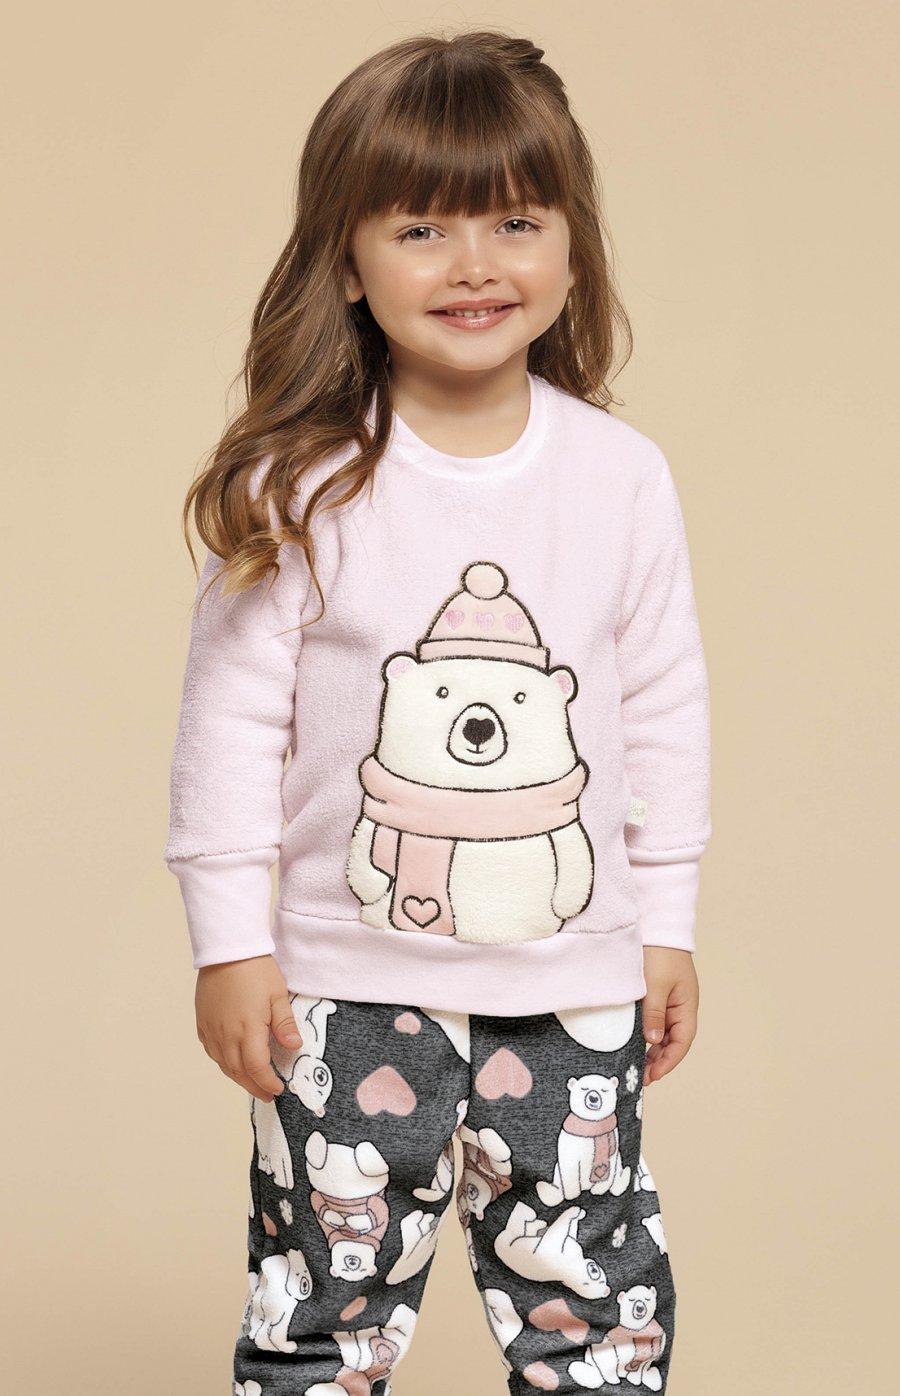 LIQUIDA Pijama Baby Soft Urso Fofolete Inverno